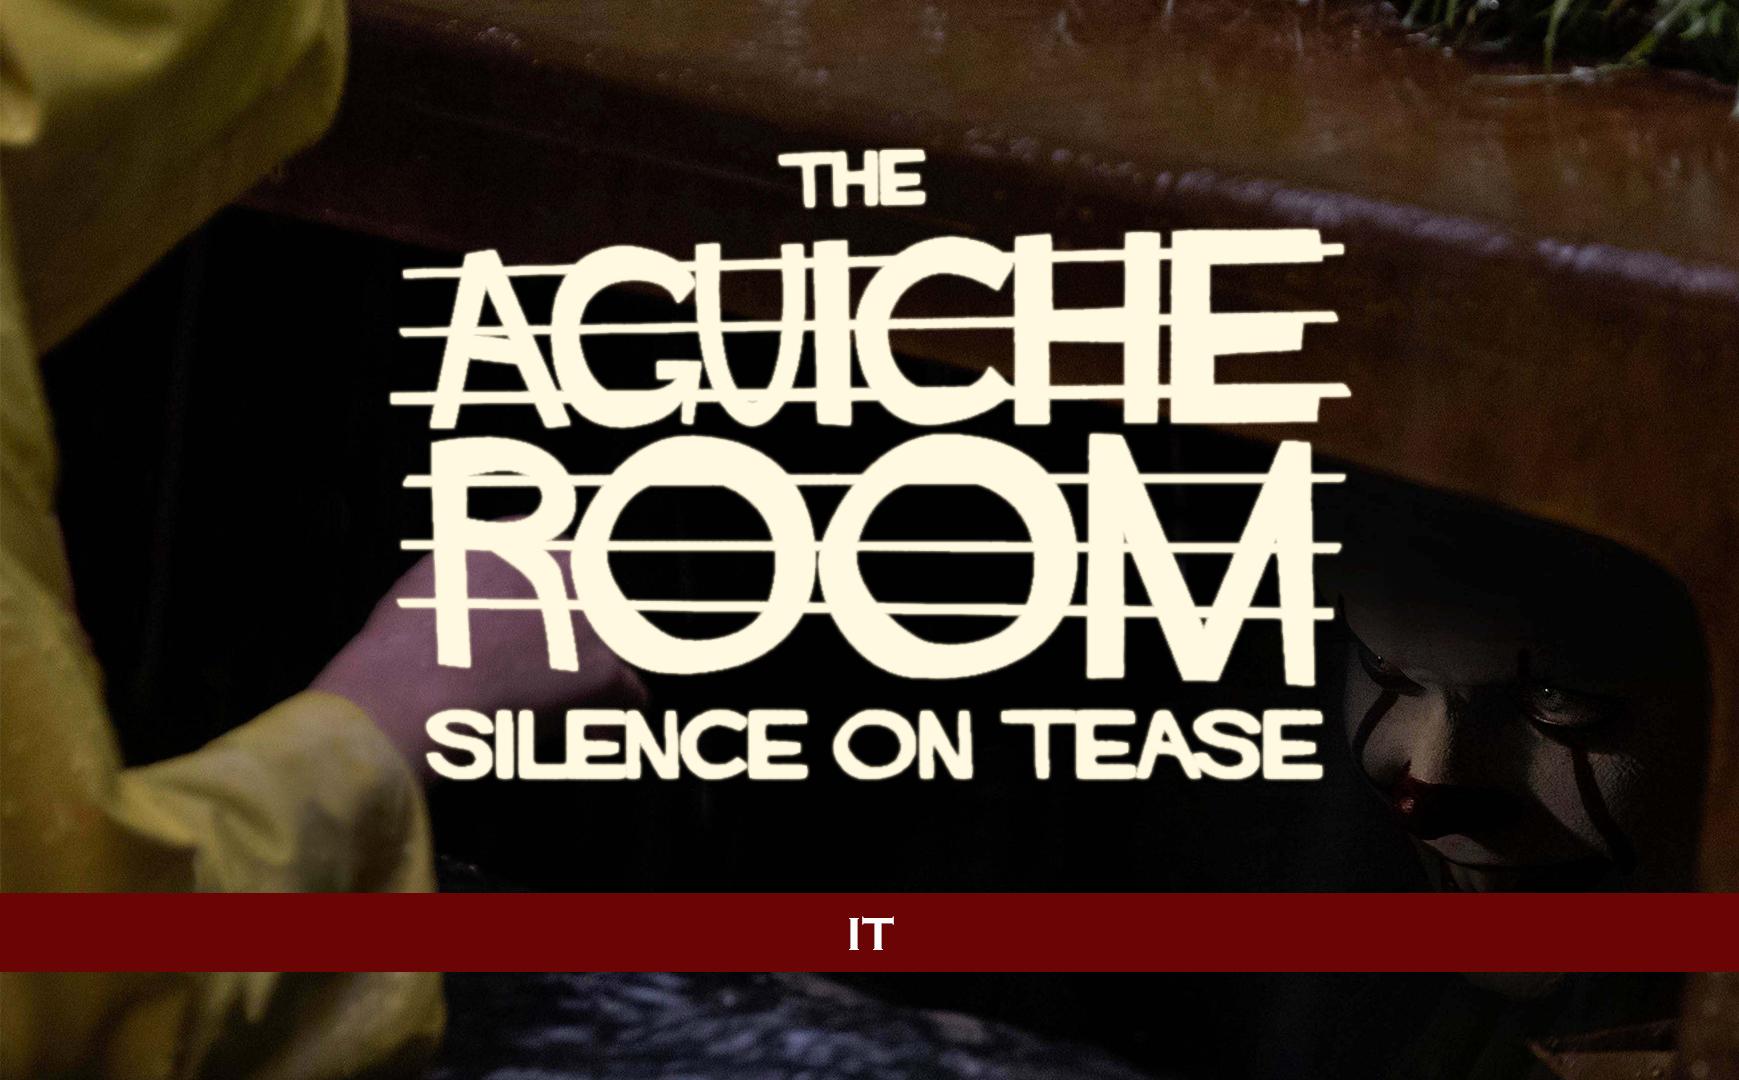 #AguicheRoom IT